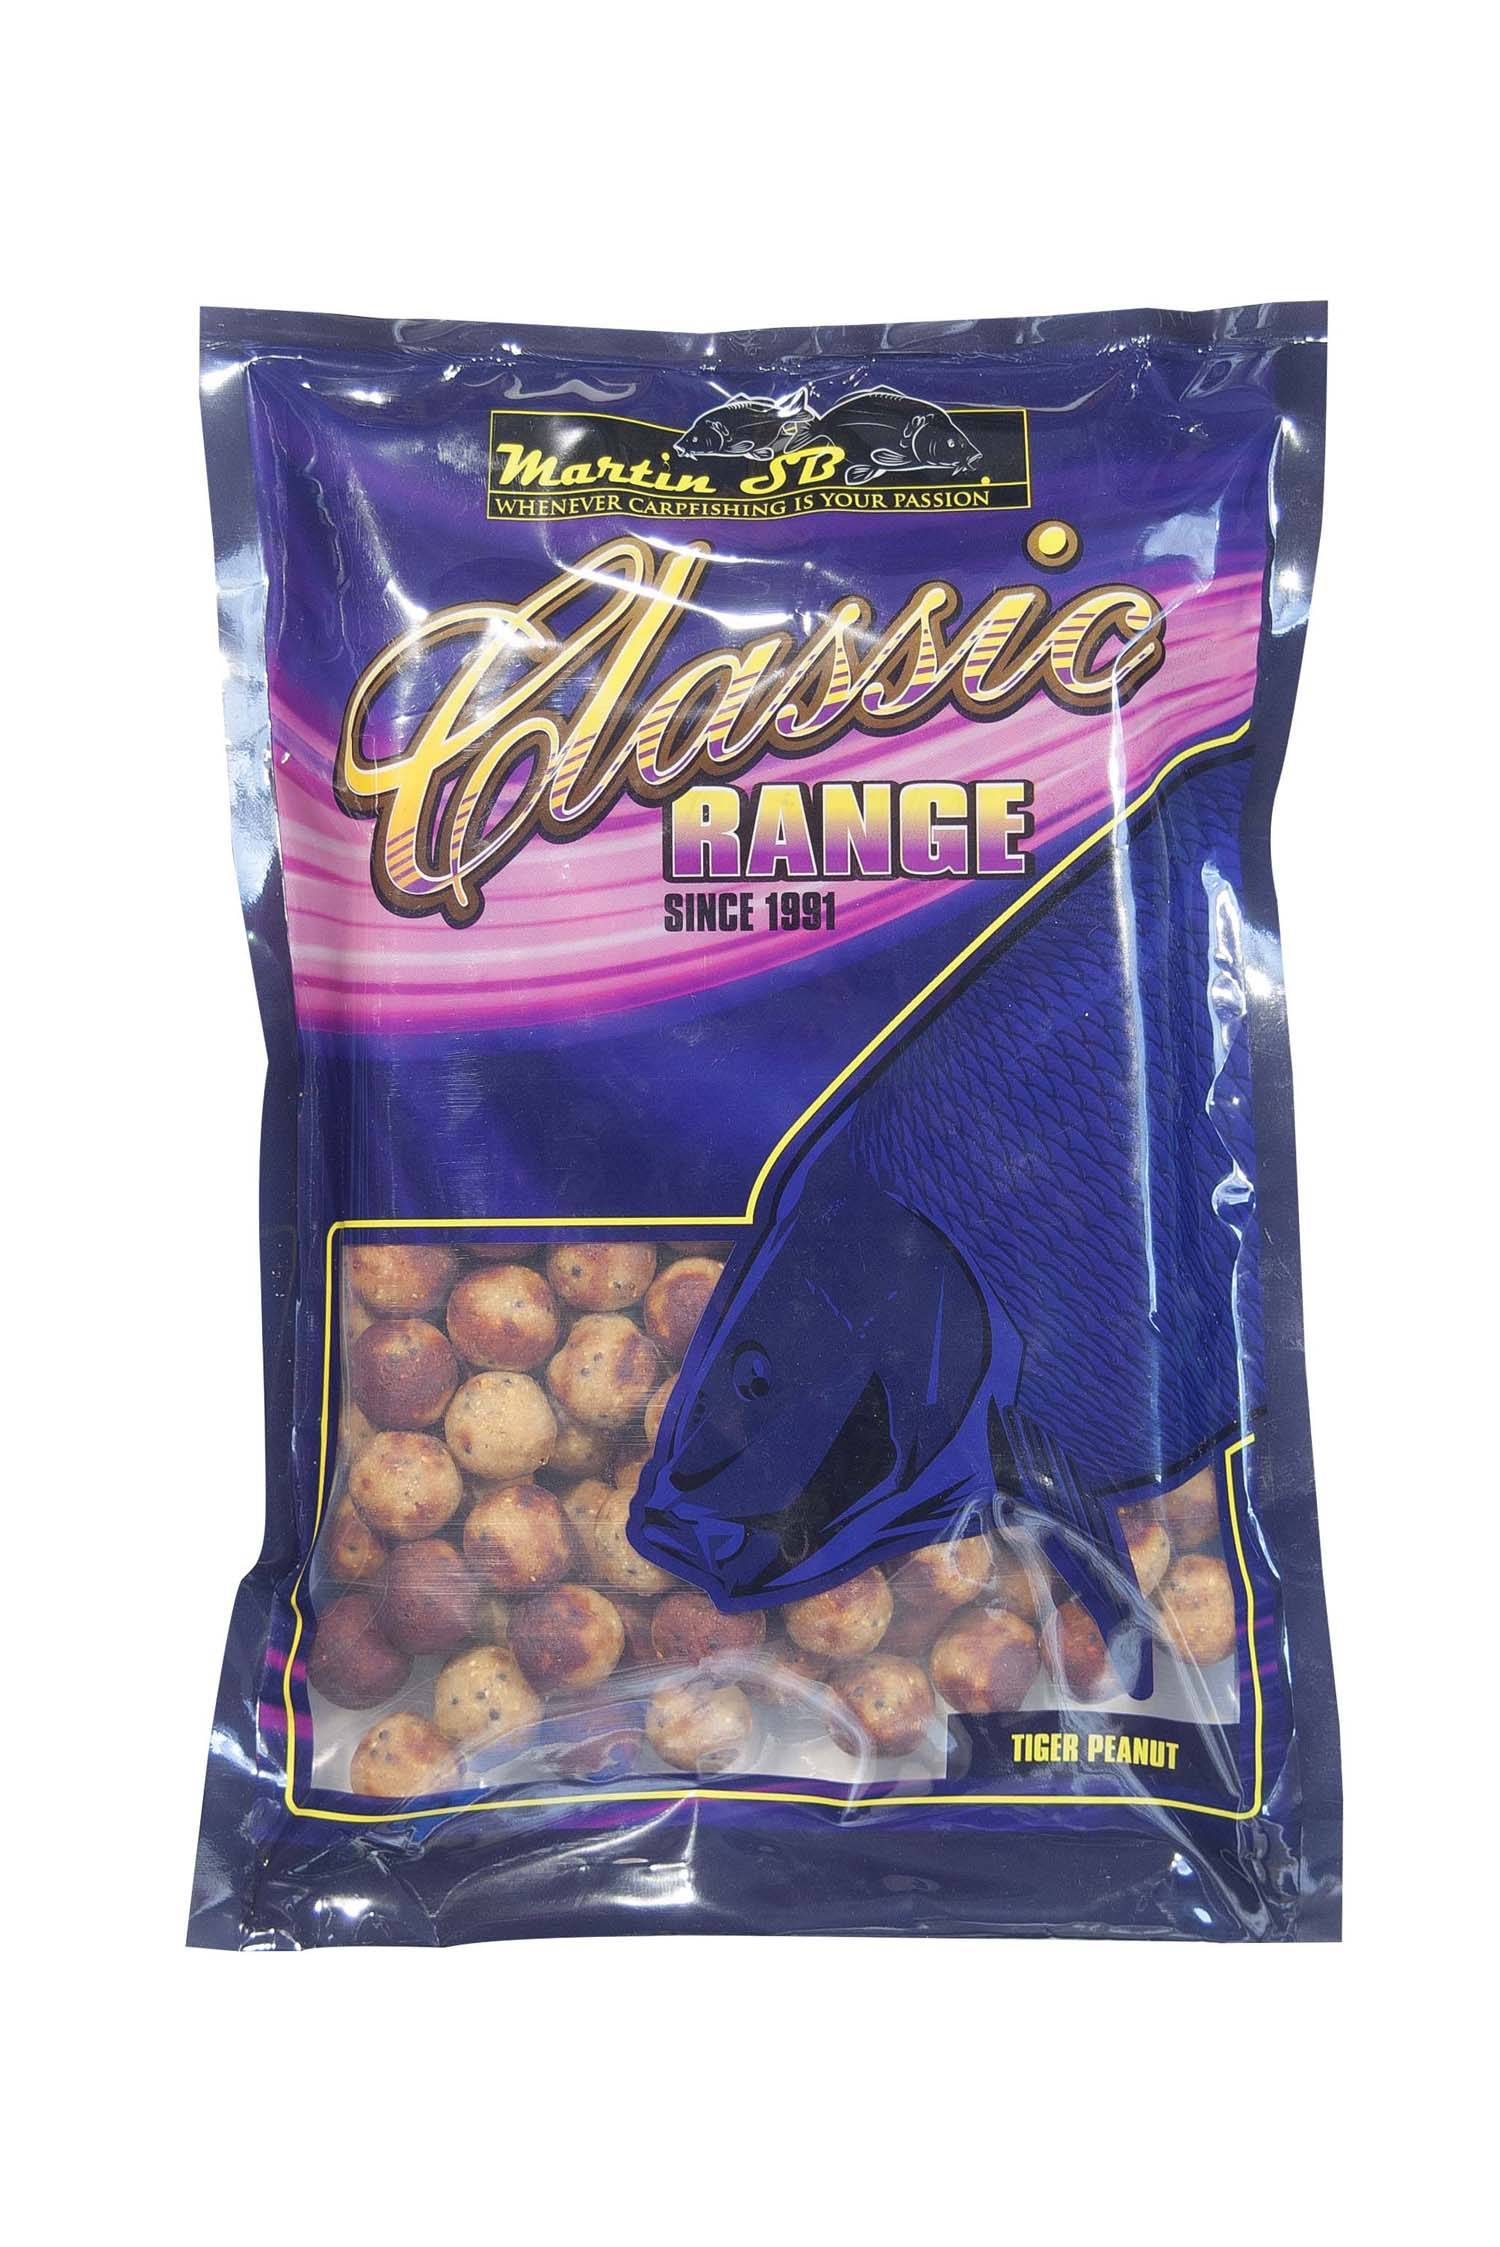 Martin SB - Bouillettes - Classic Range - Tiger Peanut